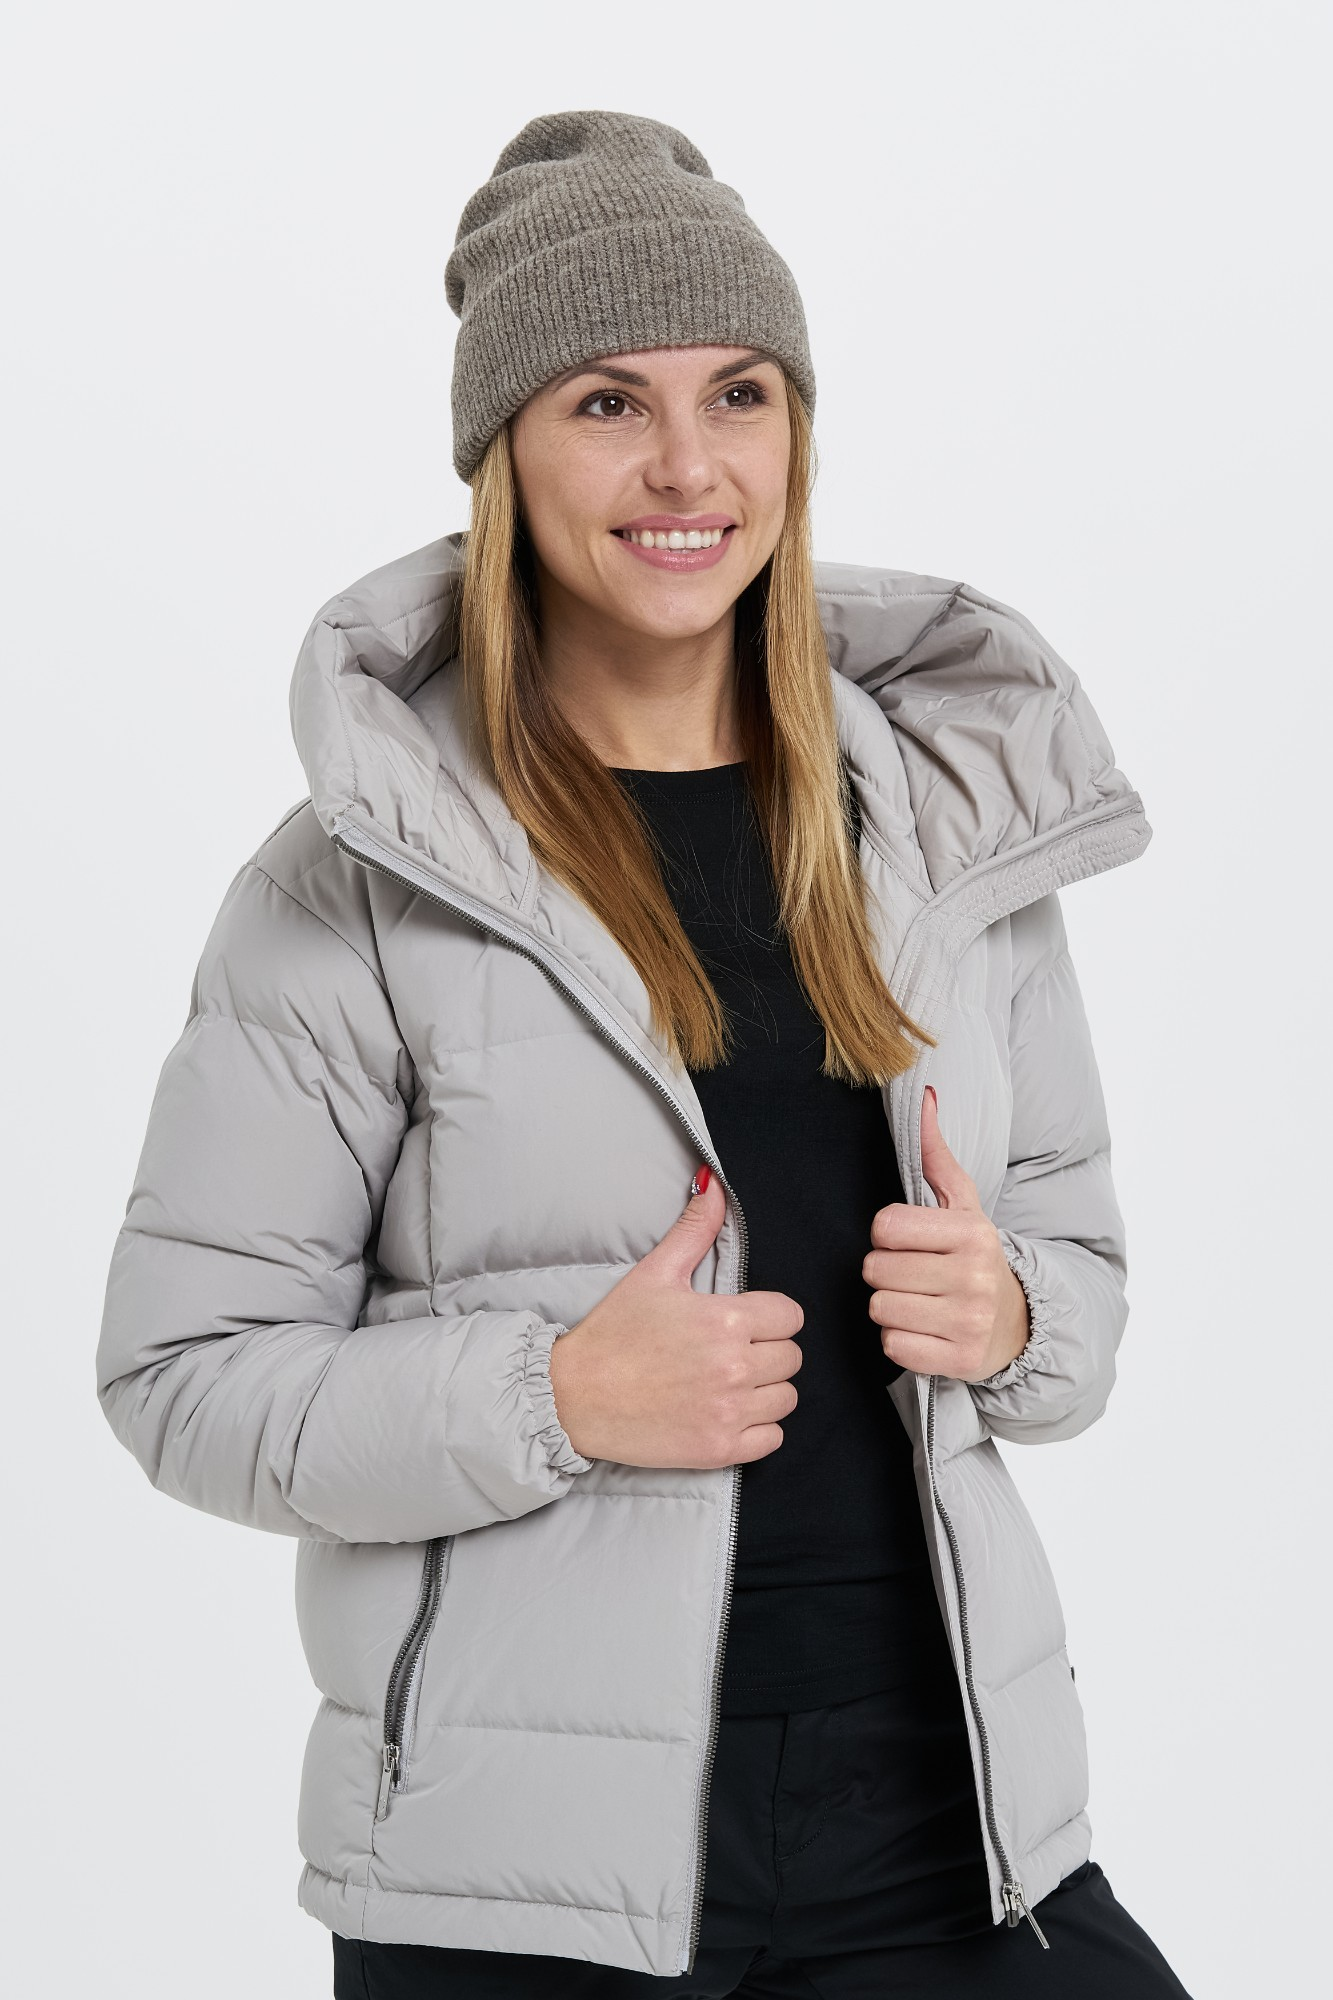 AUDIMAS Švelni megzta kepurė NOS 1-06-300 Pine Bark One Size